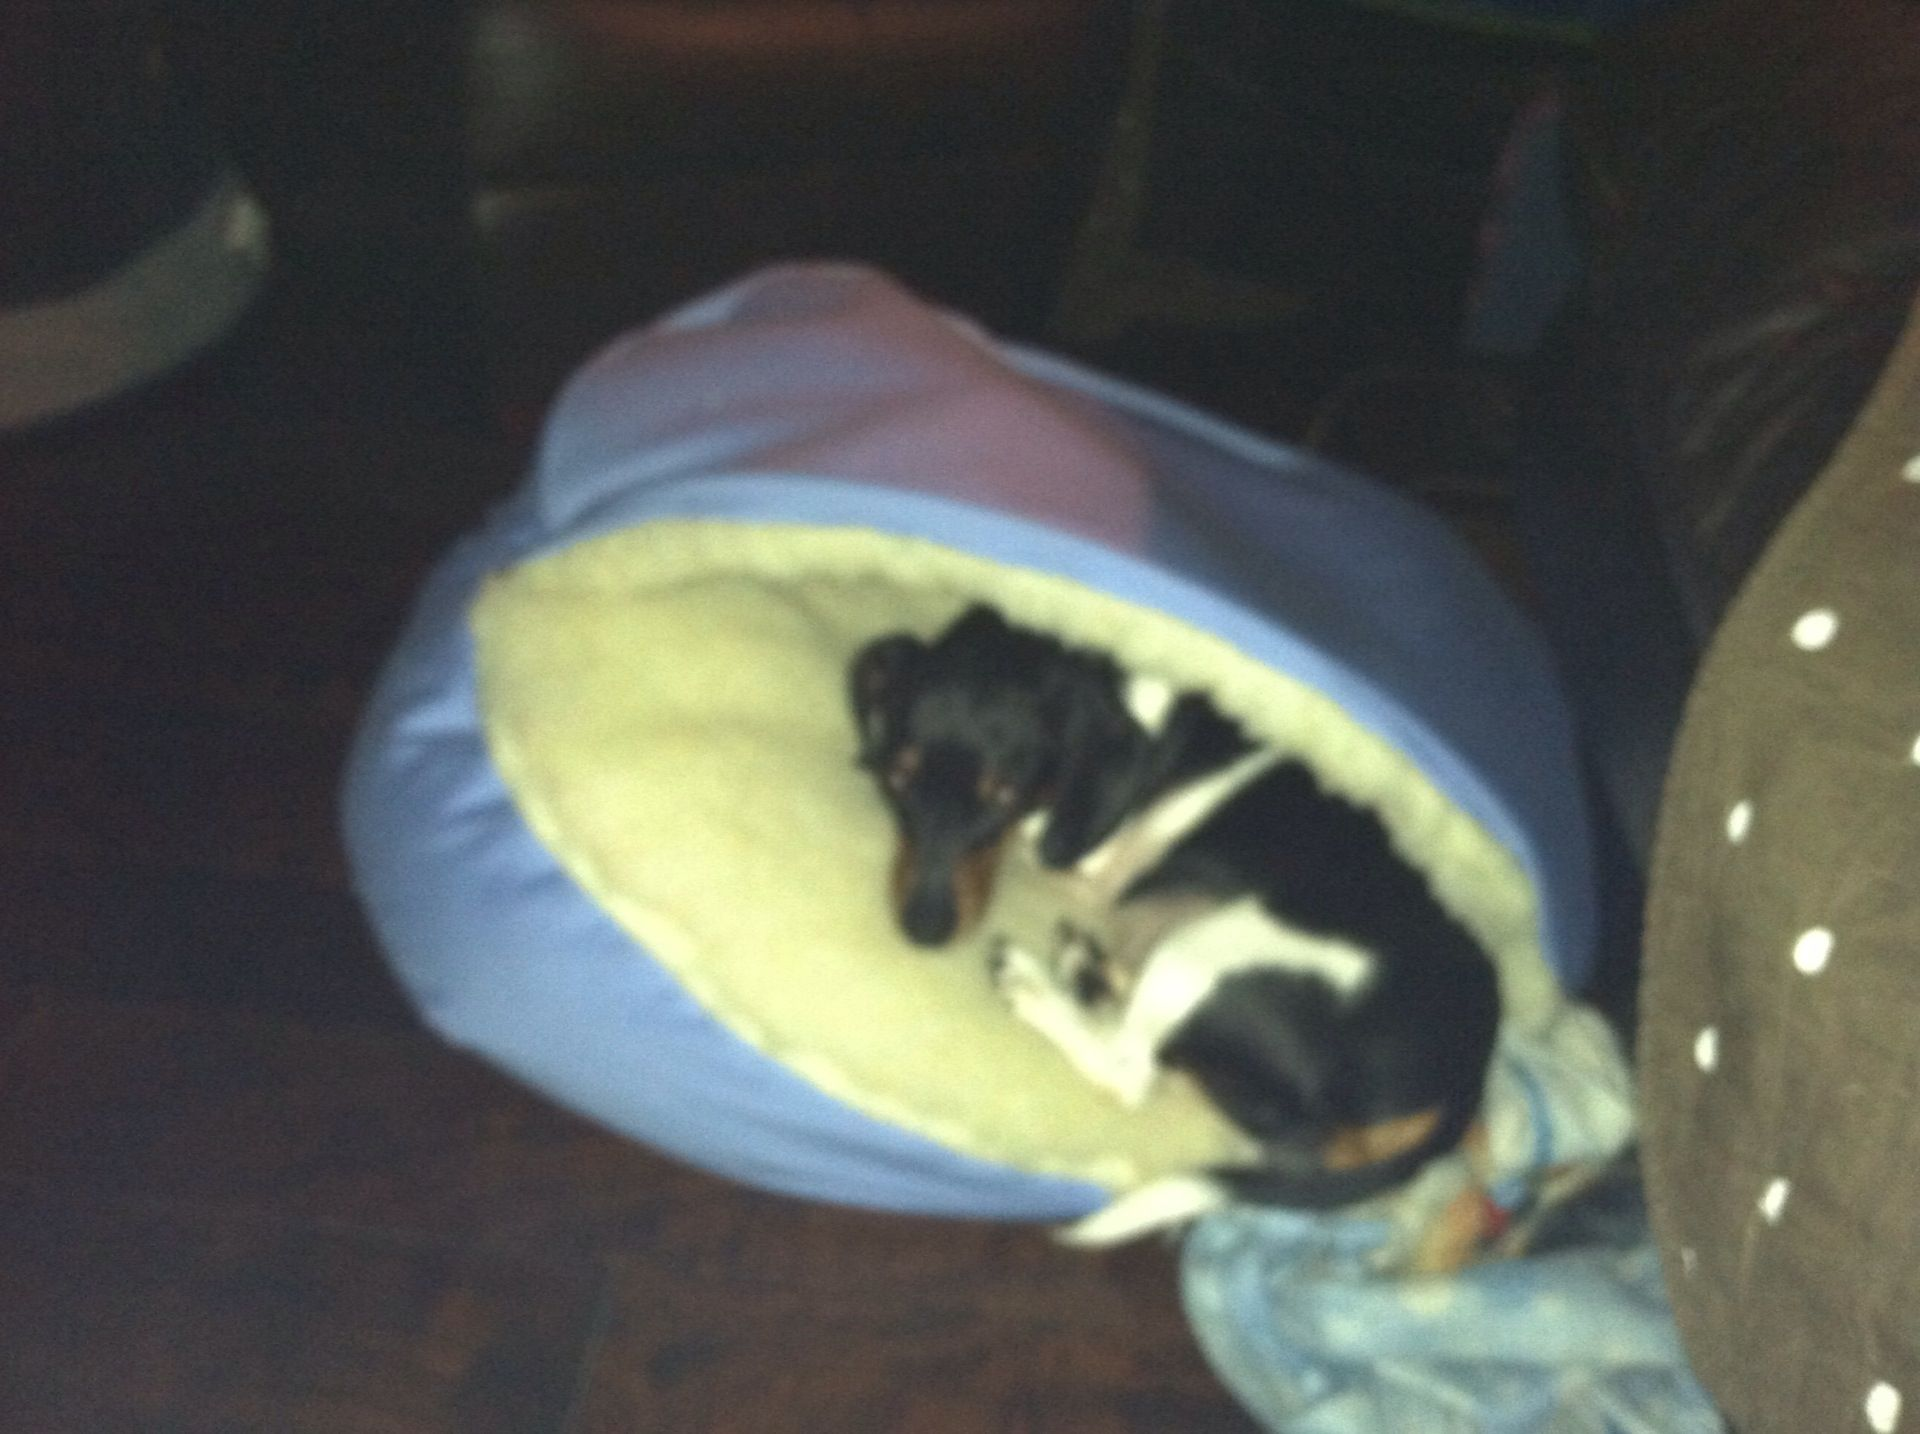 Dog Indestructible Bed